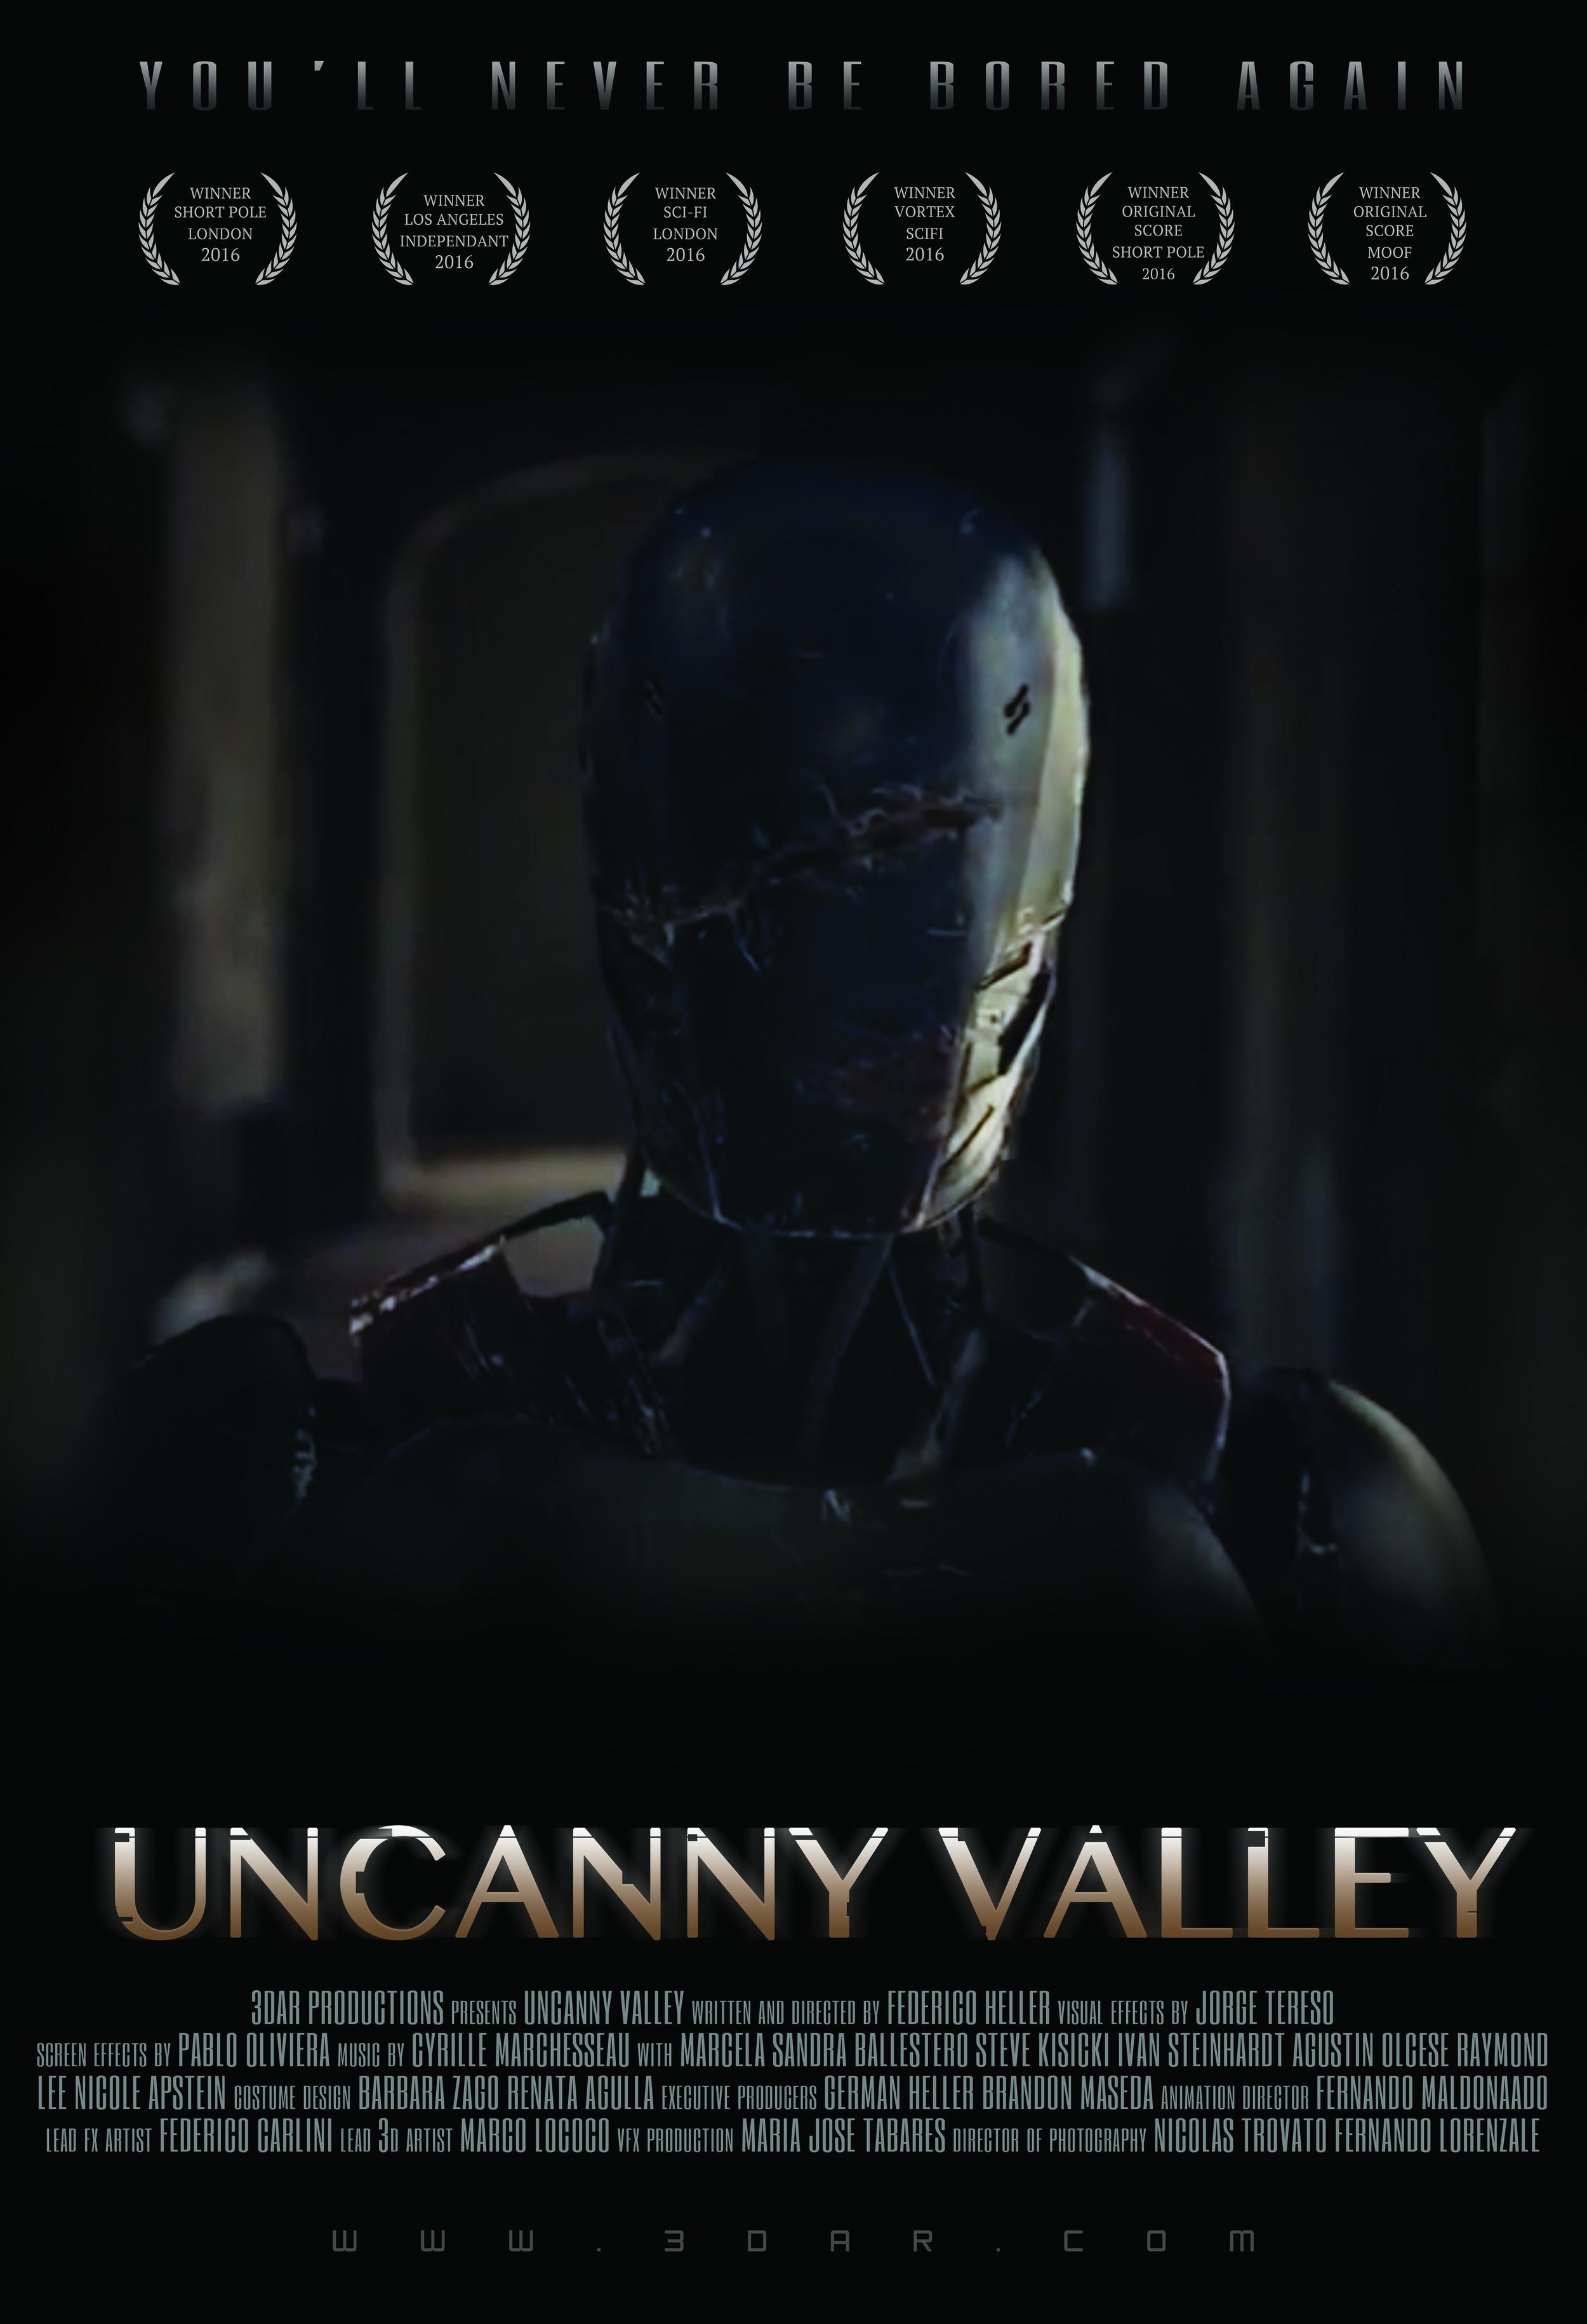 UncannyValley-Poster.jpg